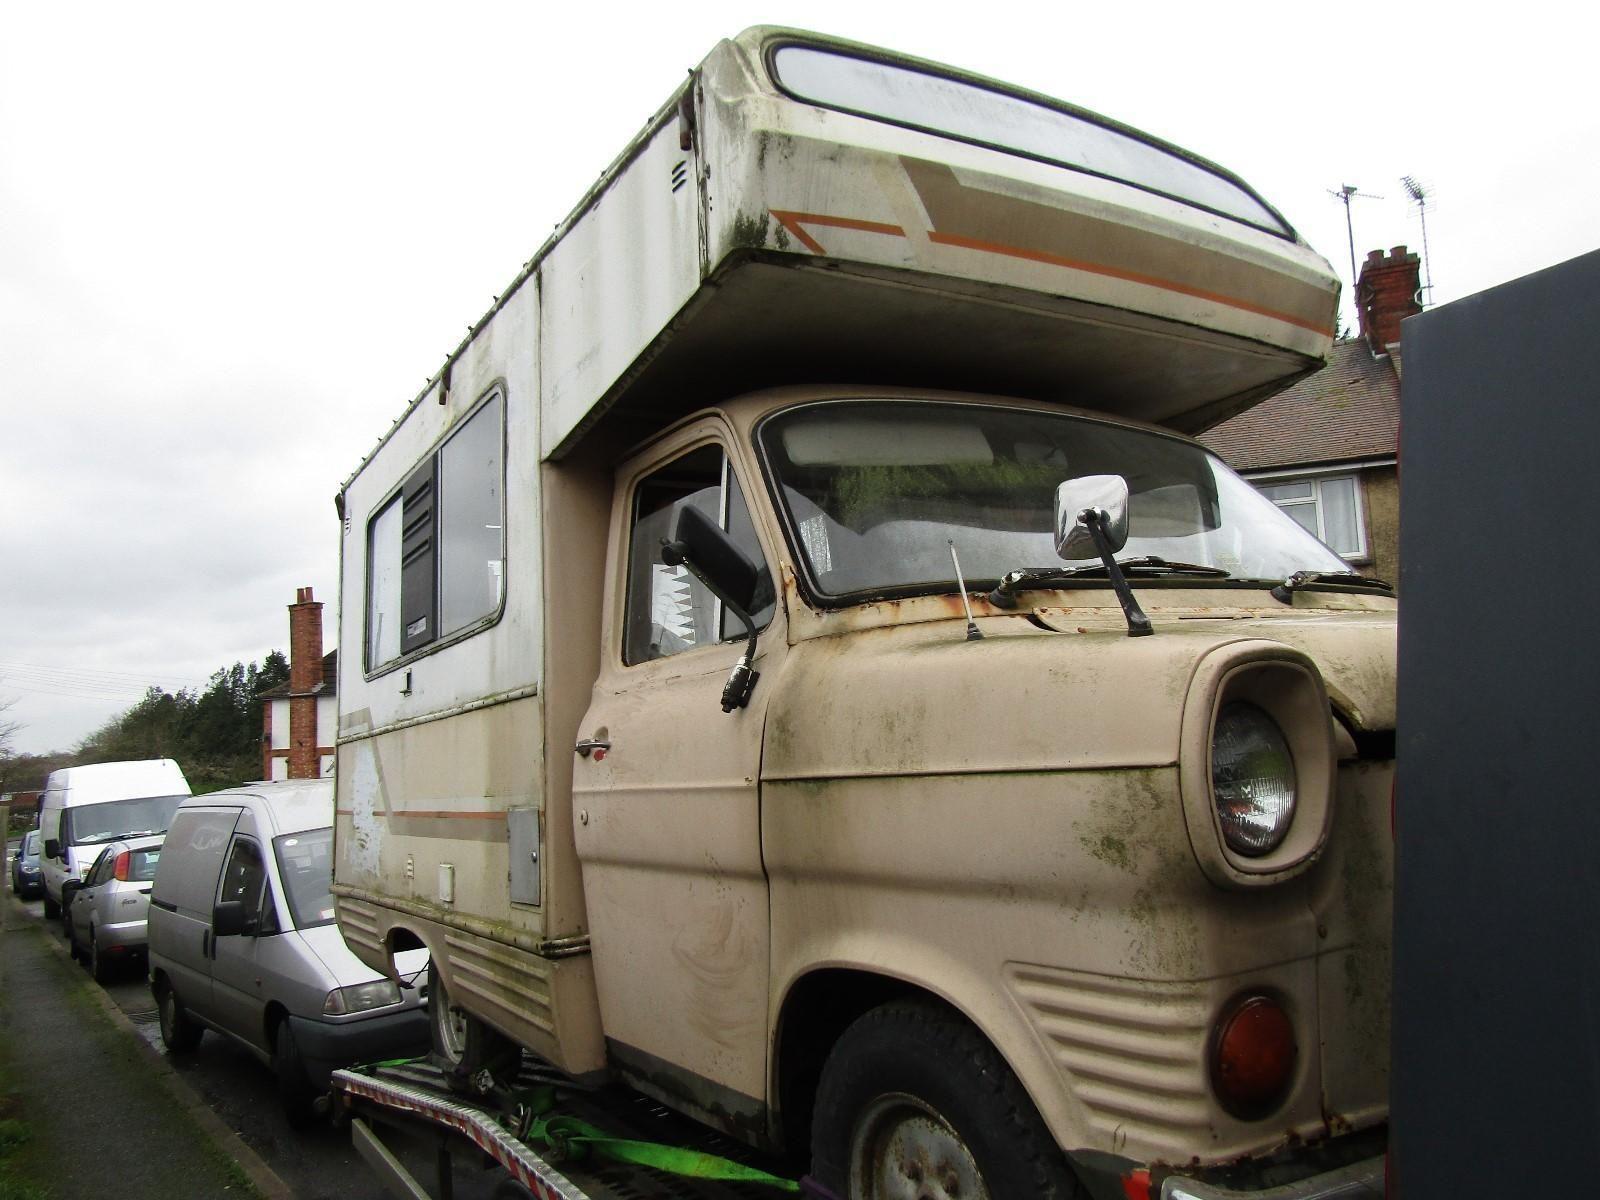 Ford transit mk1 motor caravan barn find in Cars ...